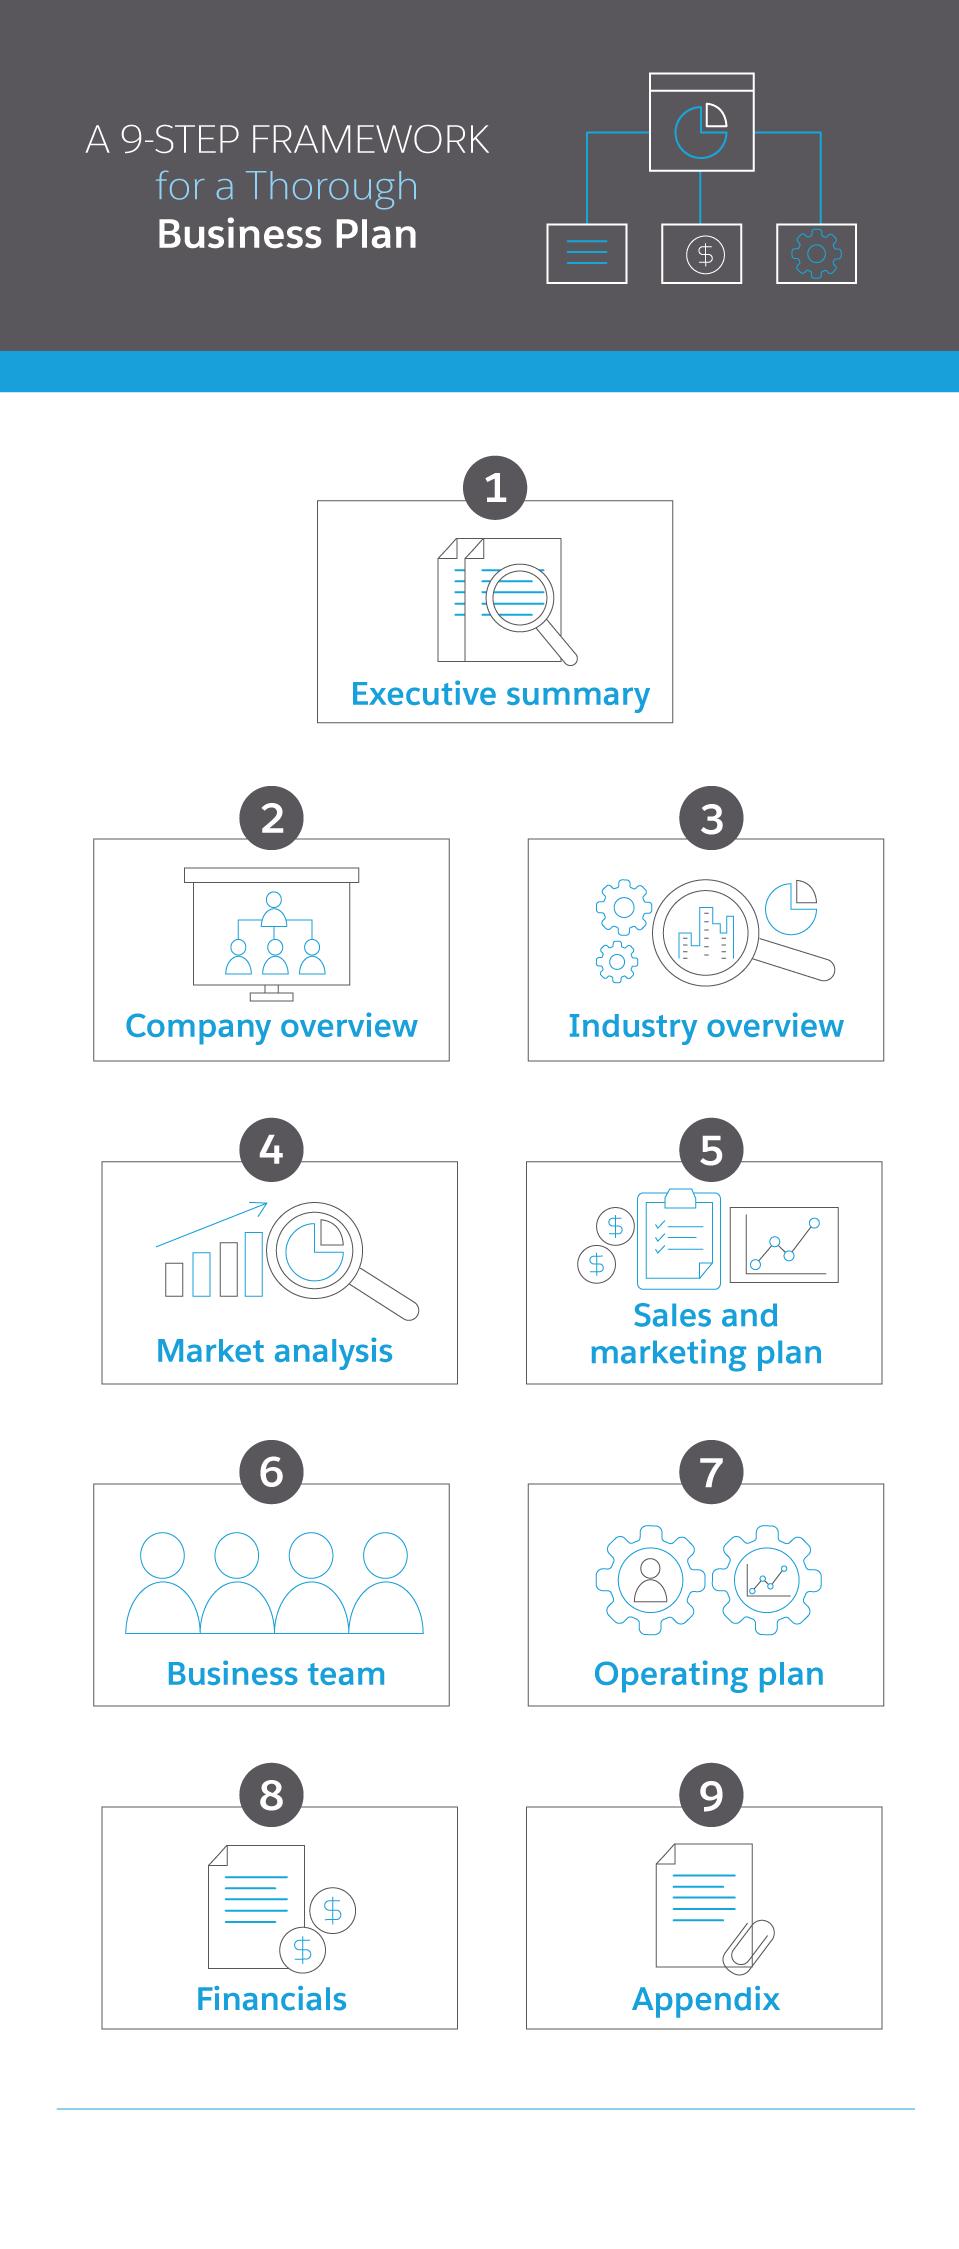 A 9 Step Framework for a Thorough Business Plan